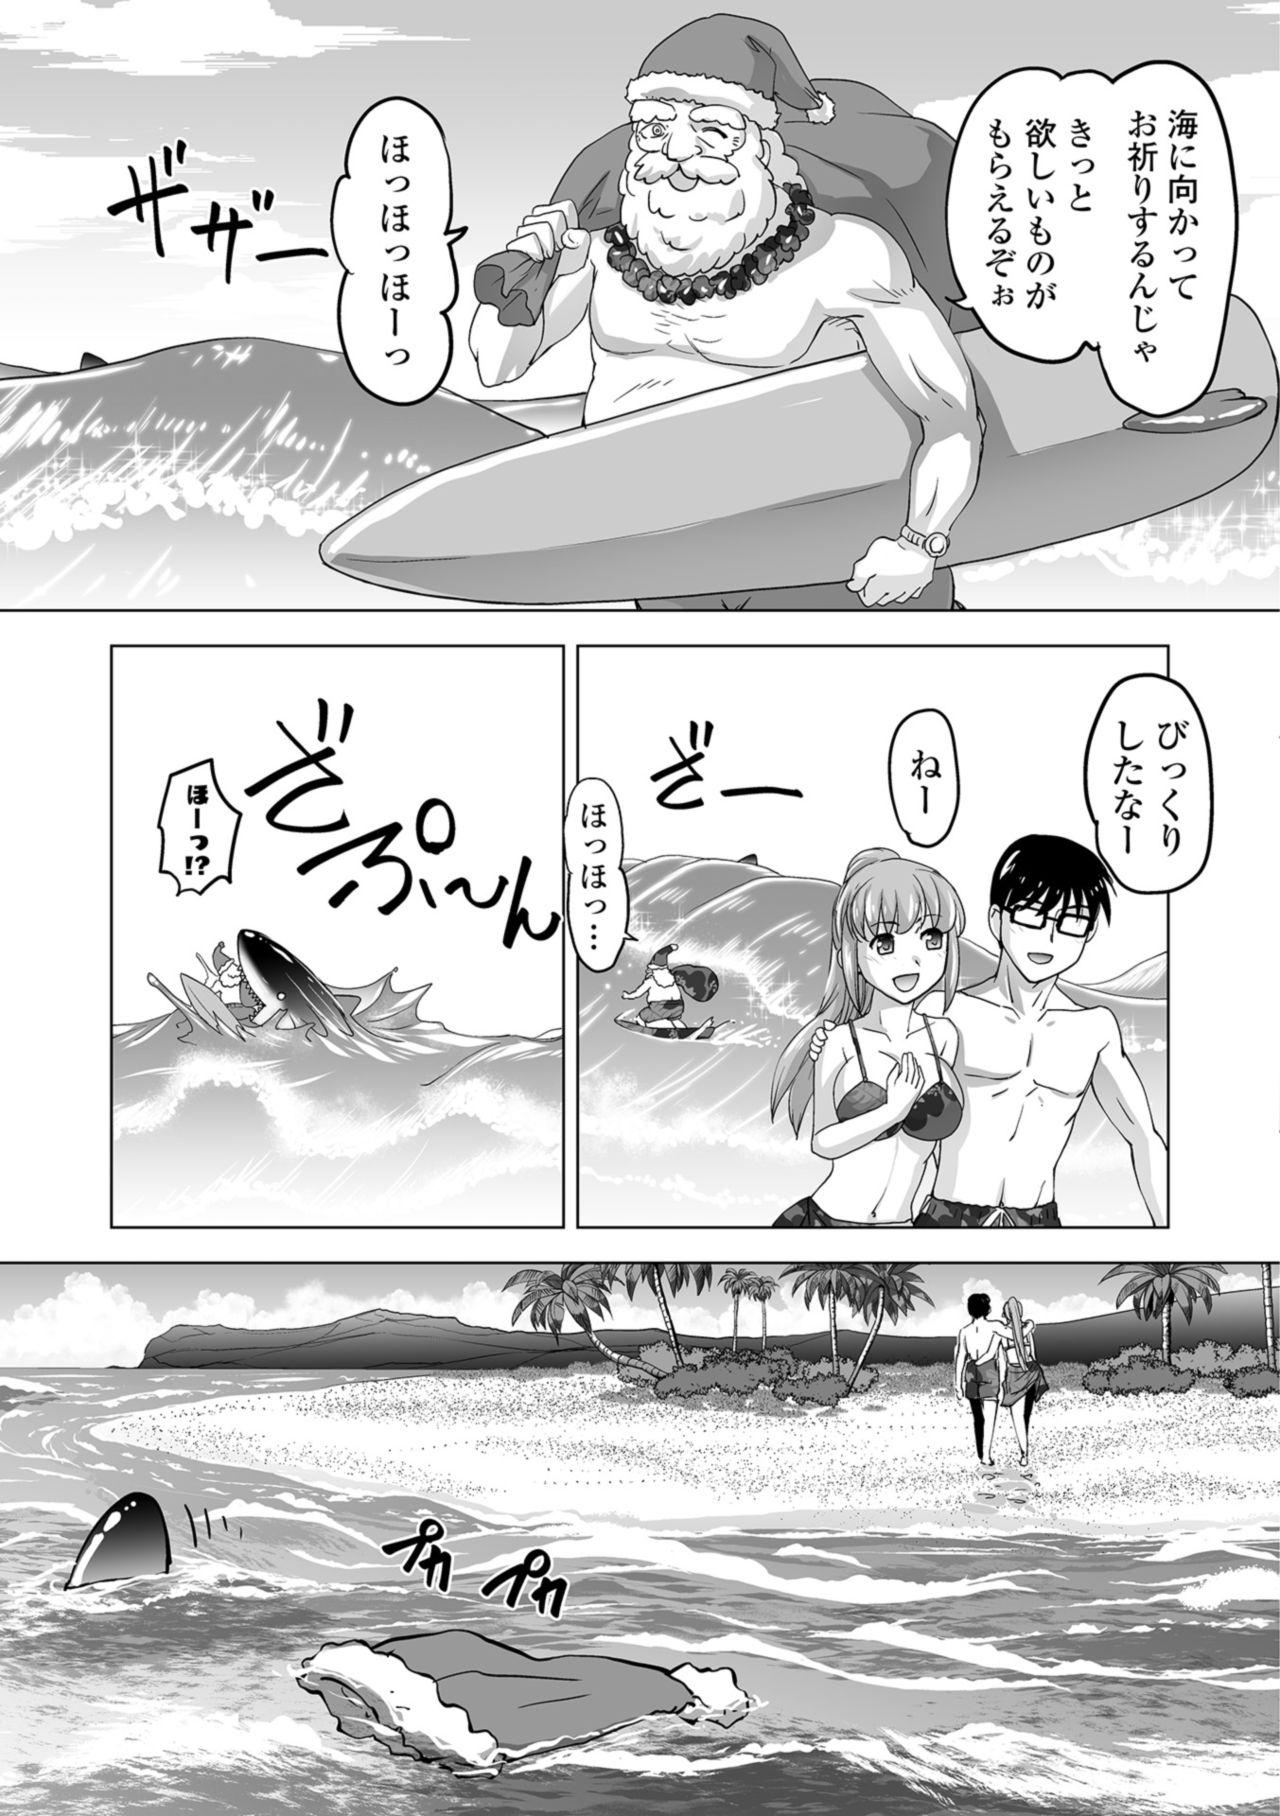 COMIC Shigekiteki SQUIRT!! Vol. 09 122